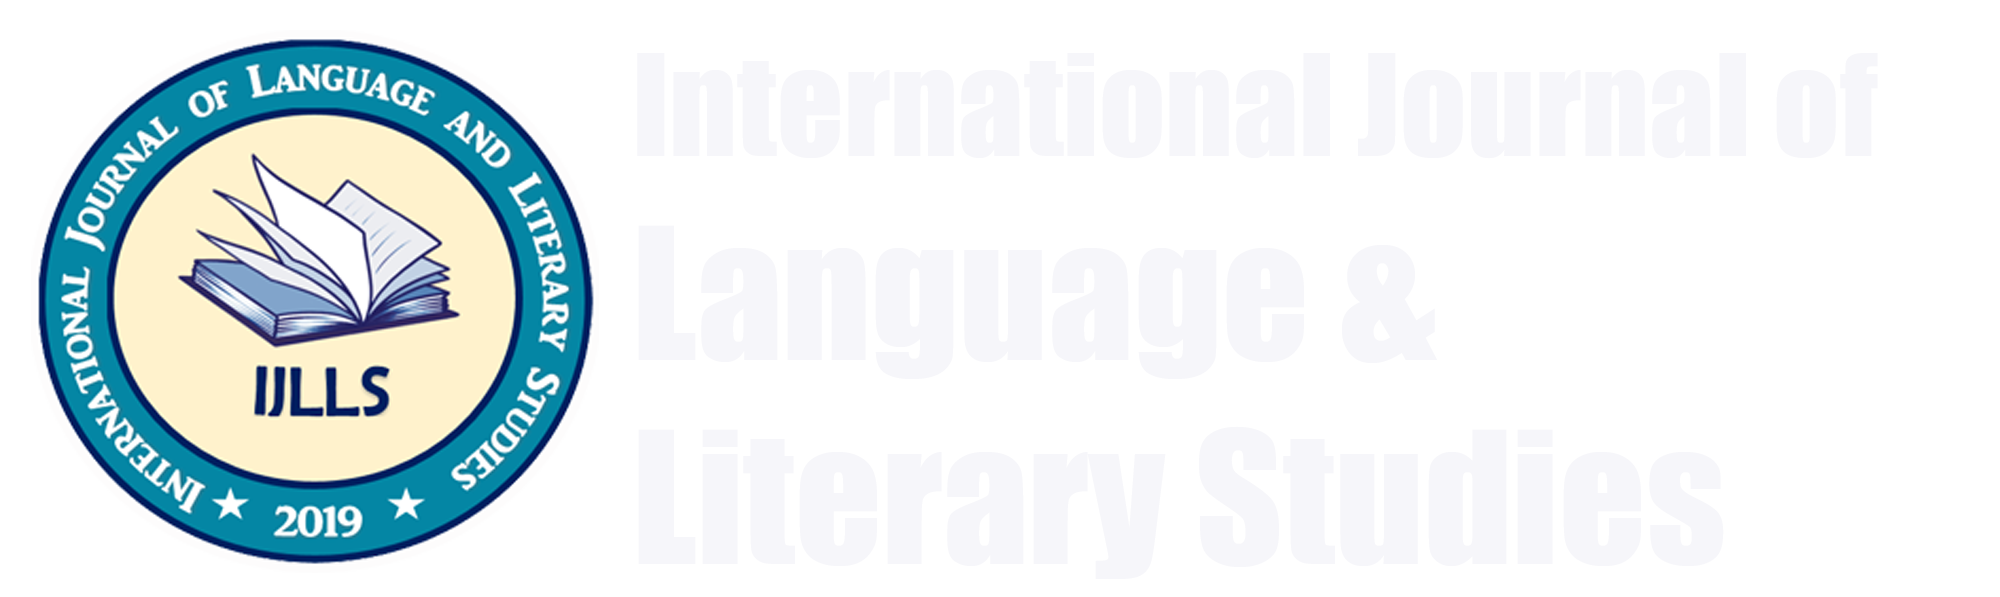 International Journal of Language and Literary Studies